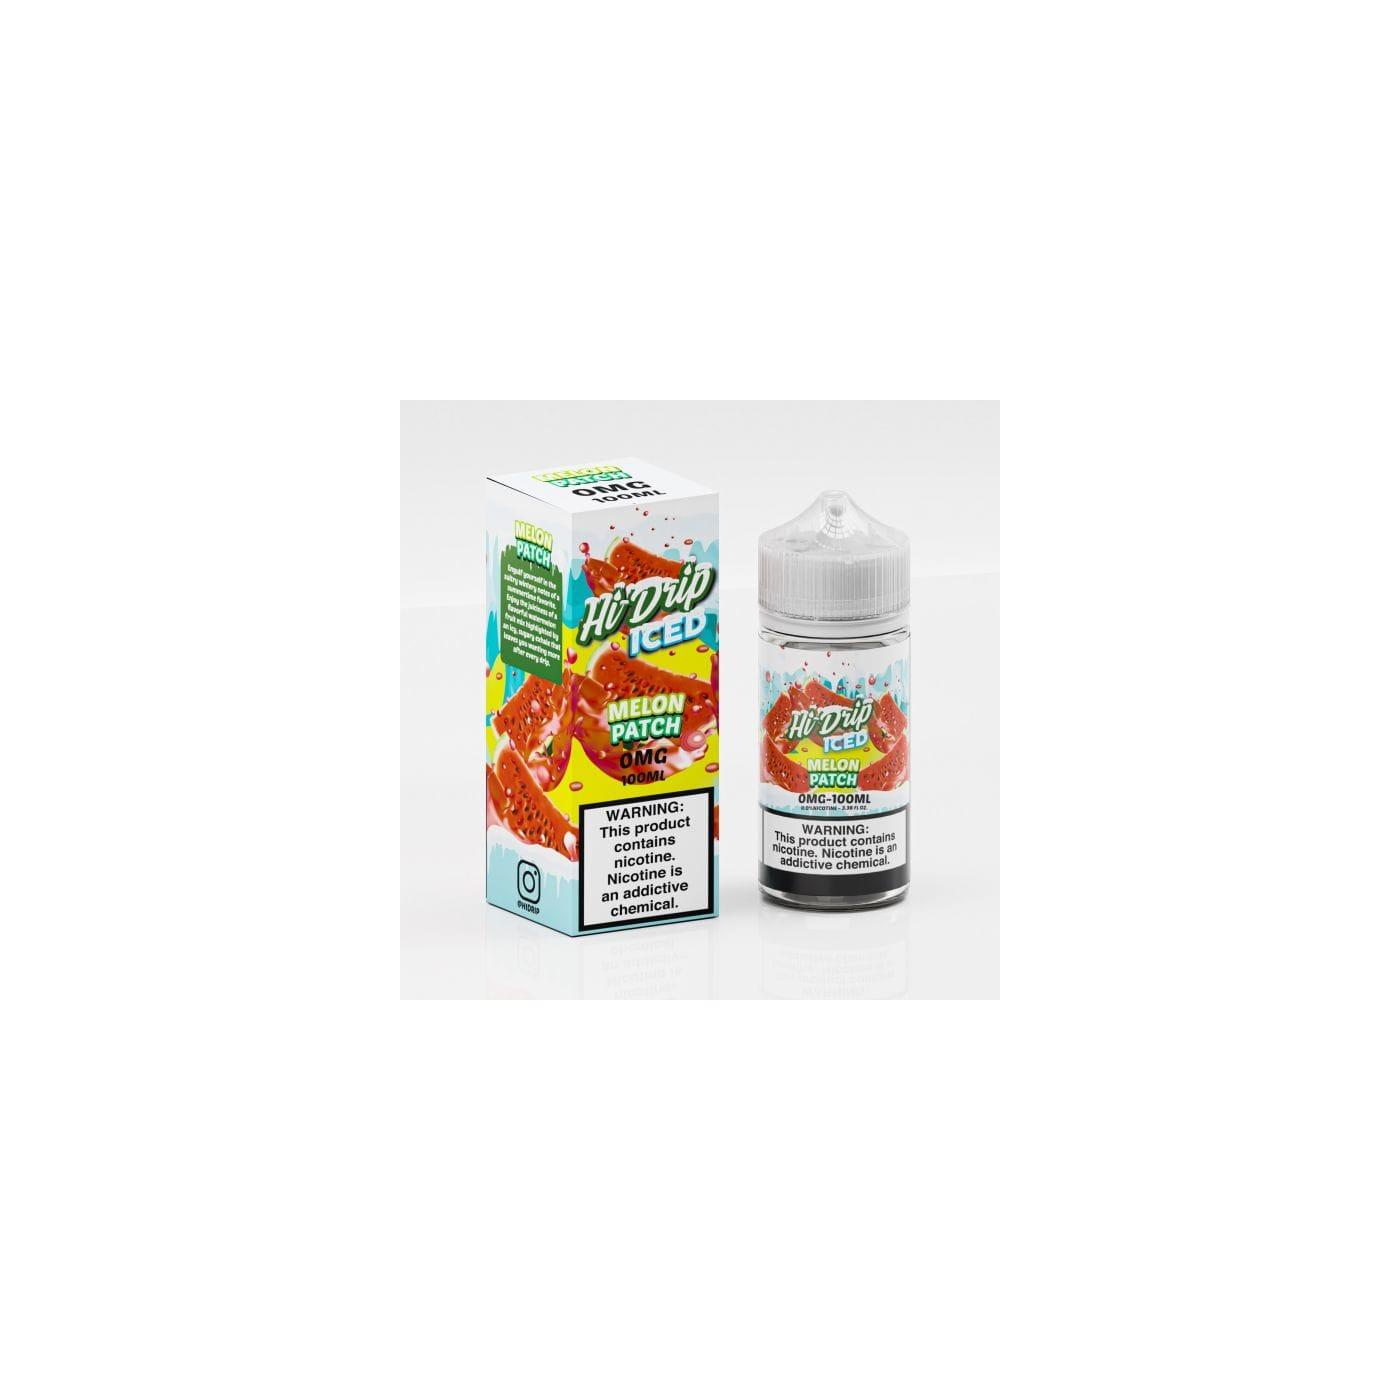 Hi-Drip Melon Patch Iced